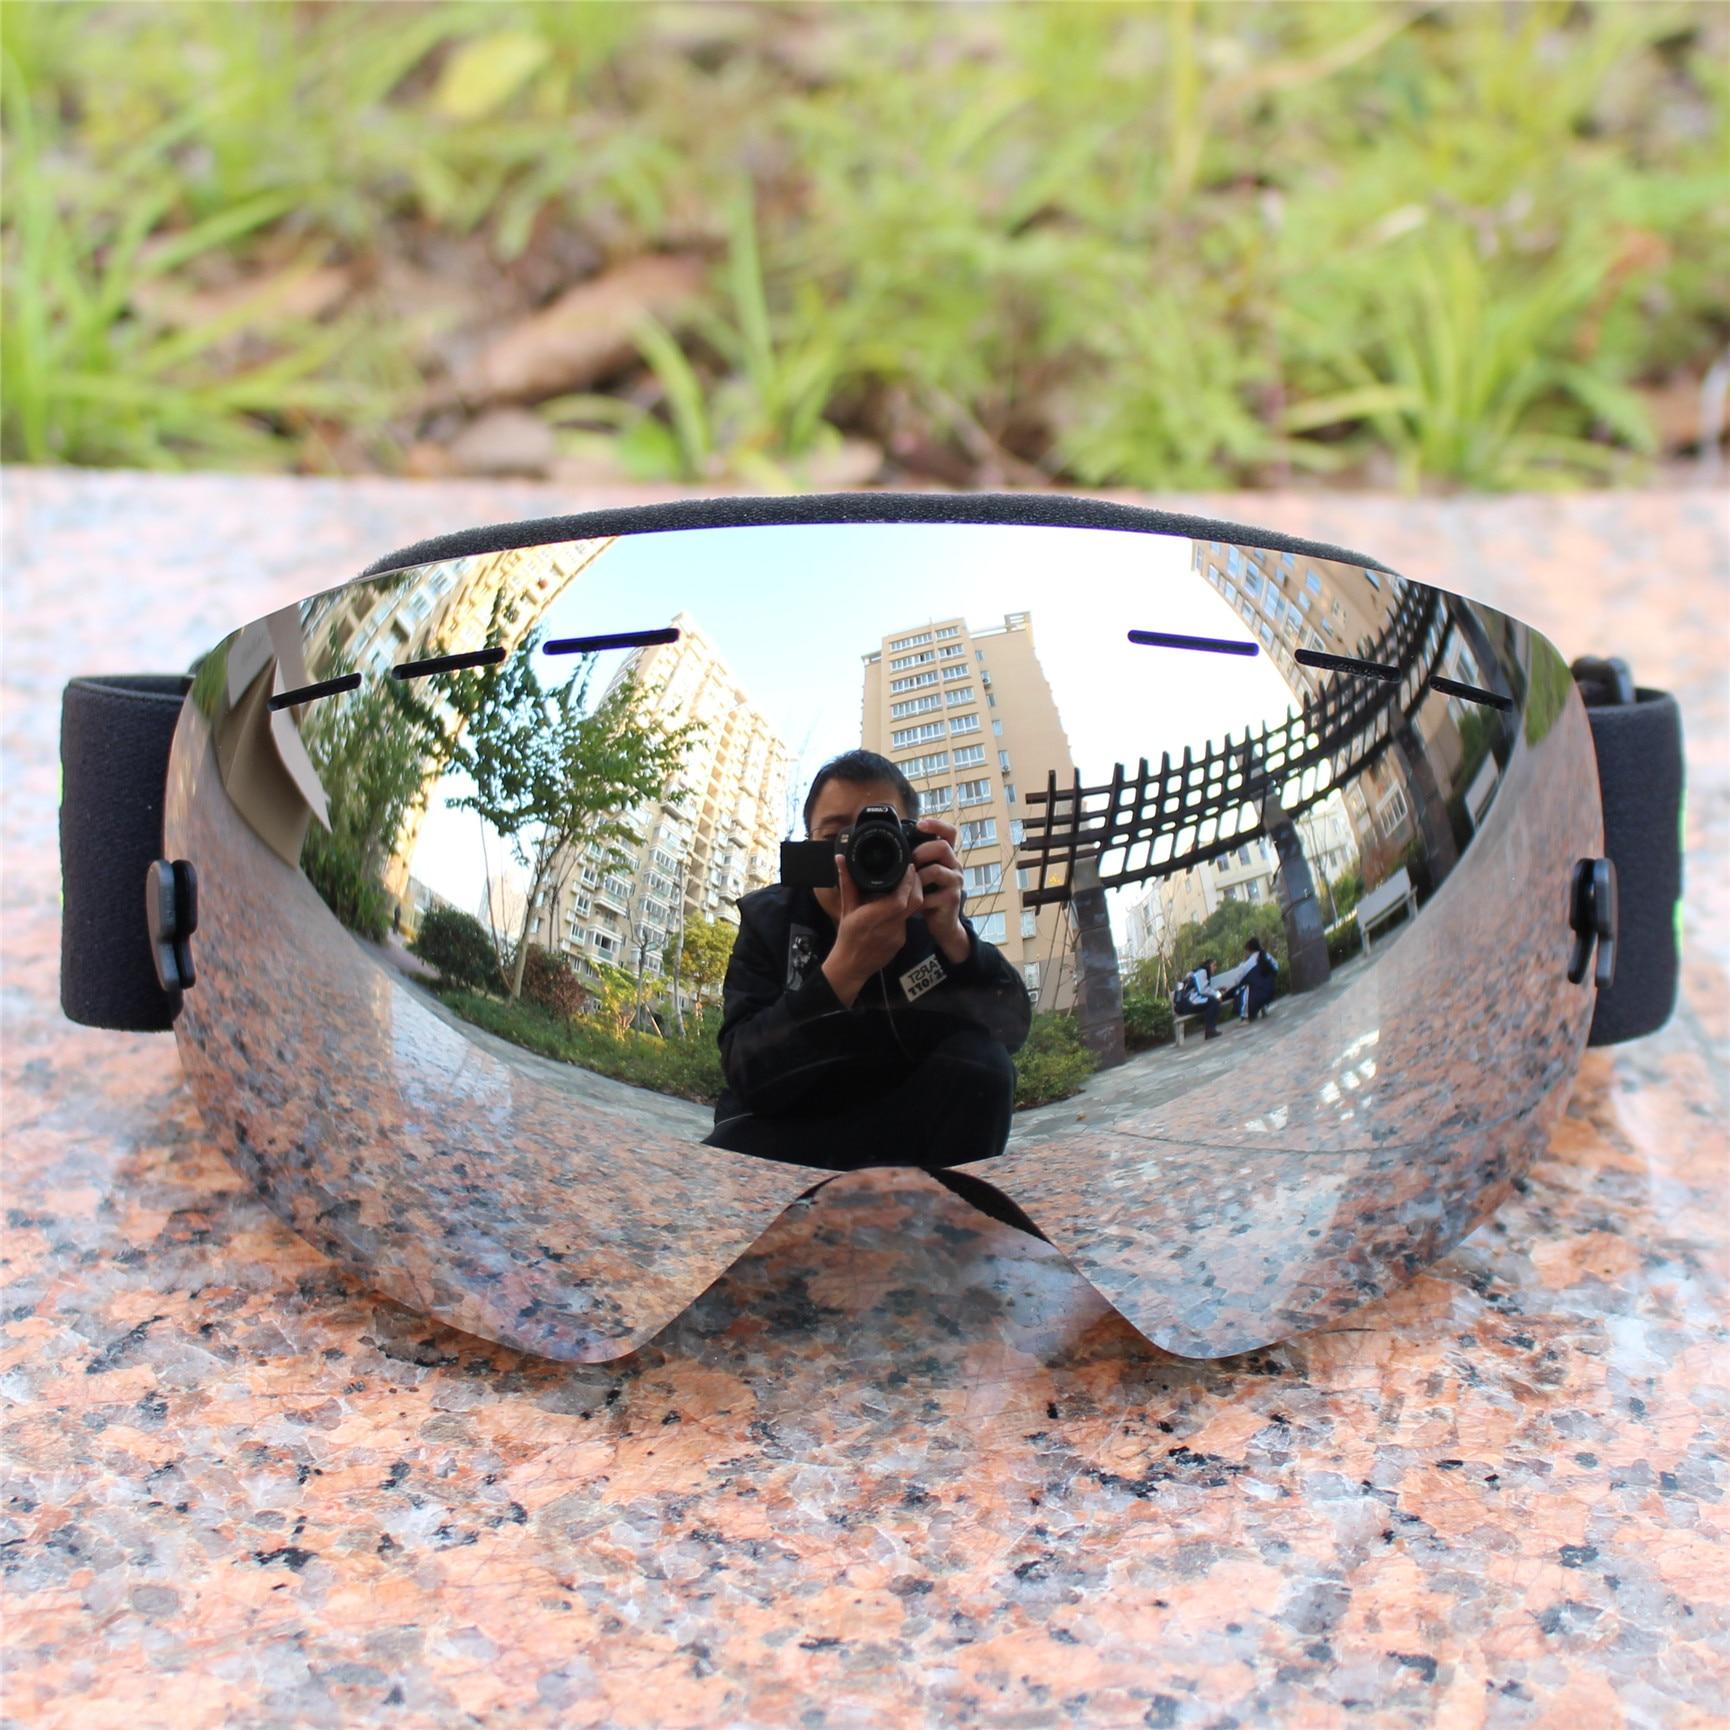 professional ski goggles layers lens Adult  anti-fog UV400 glasses skiing snowboard men women snow 025 4 colors